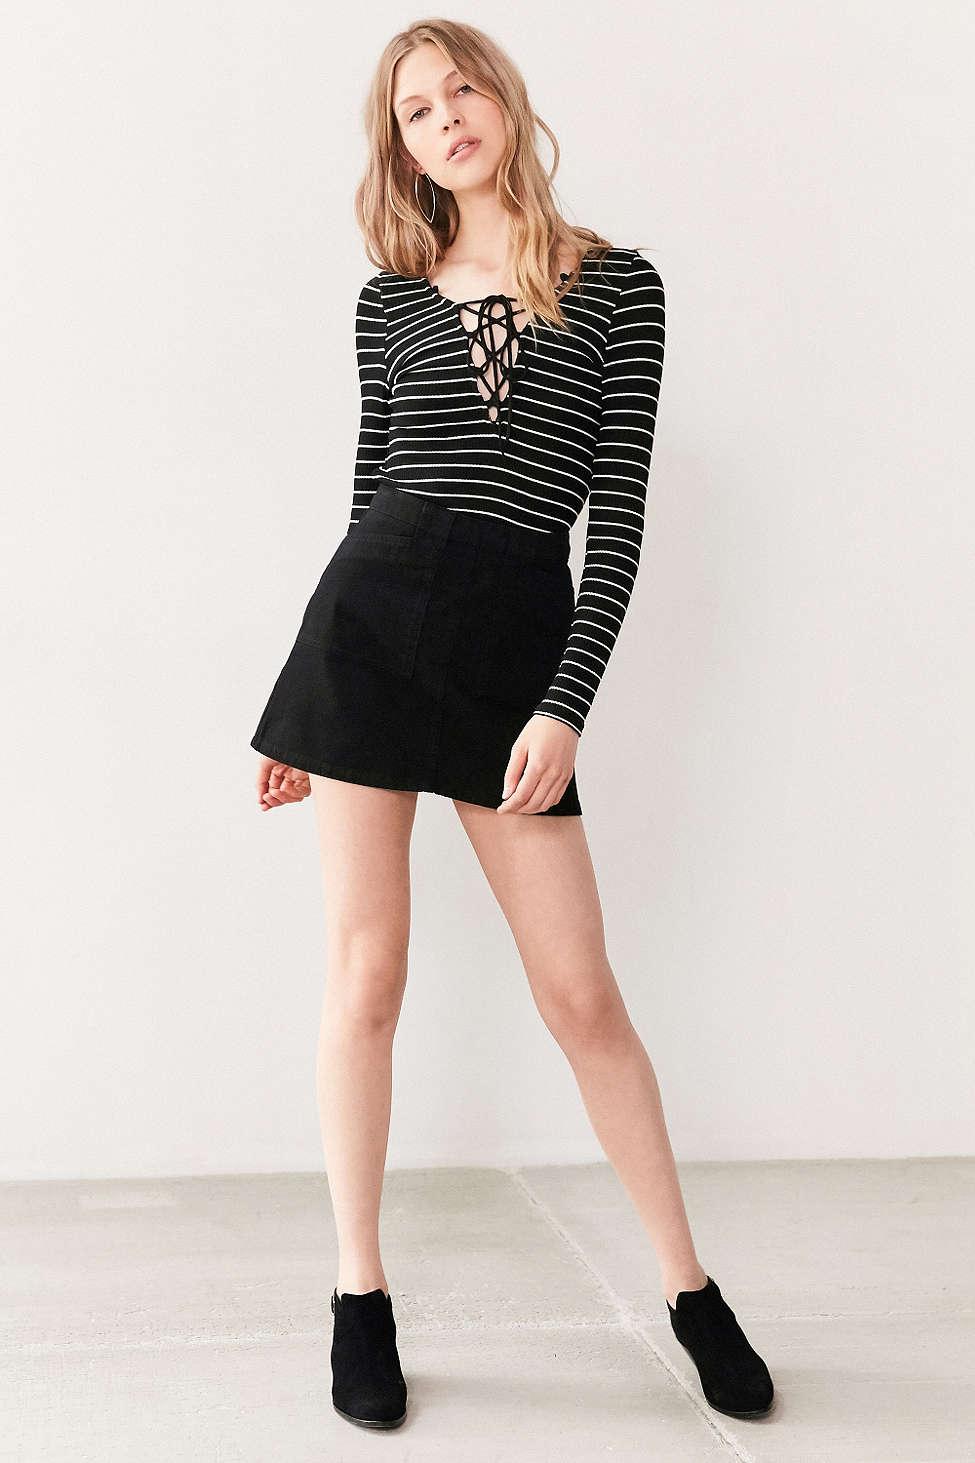 BDG Twill Utility Mini Skirt - The Perfect A-line Mini Skirt